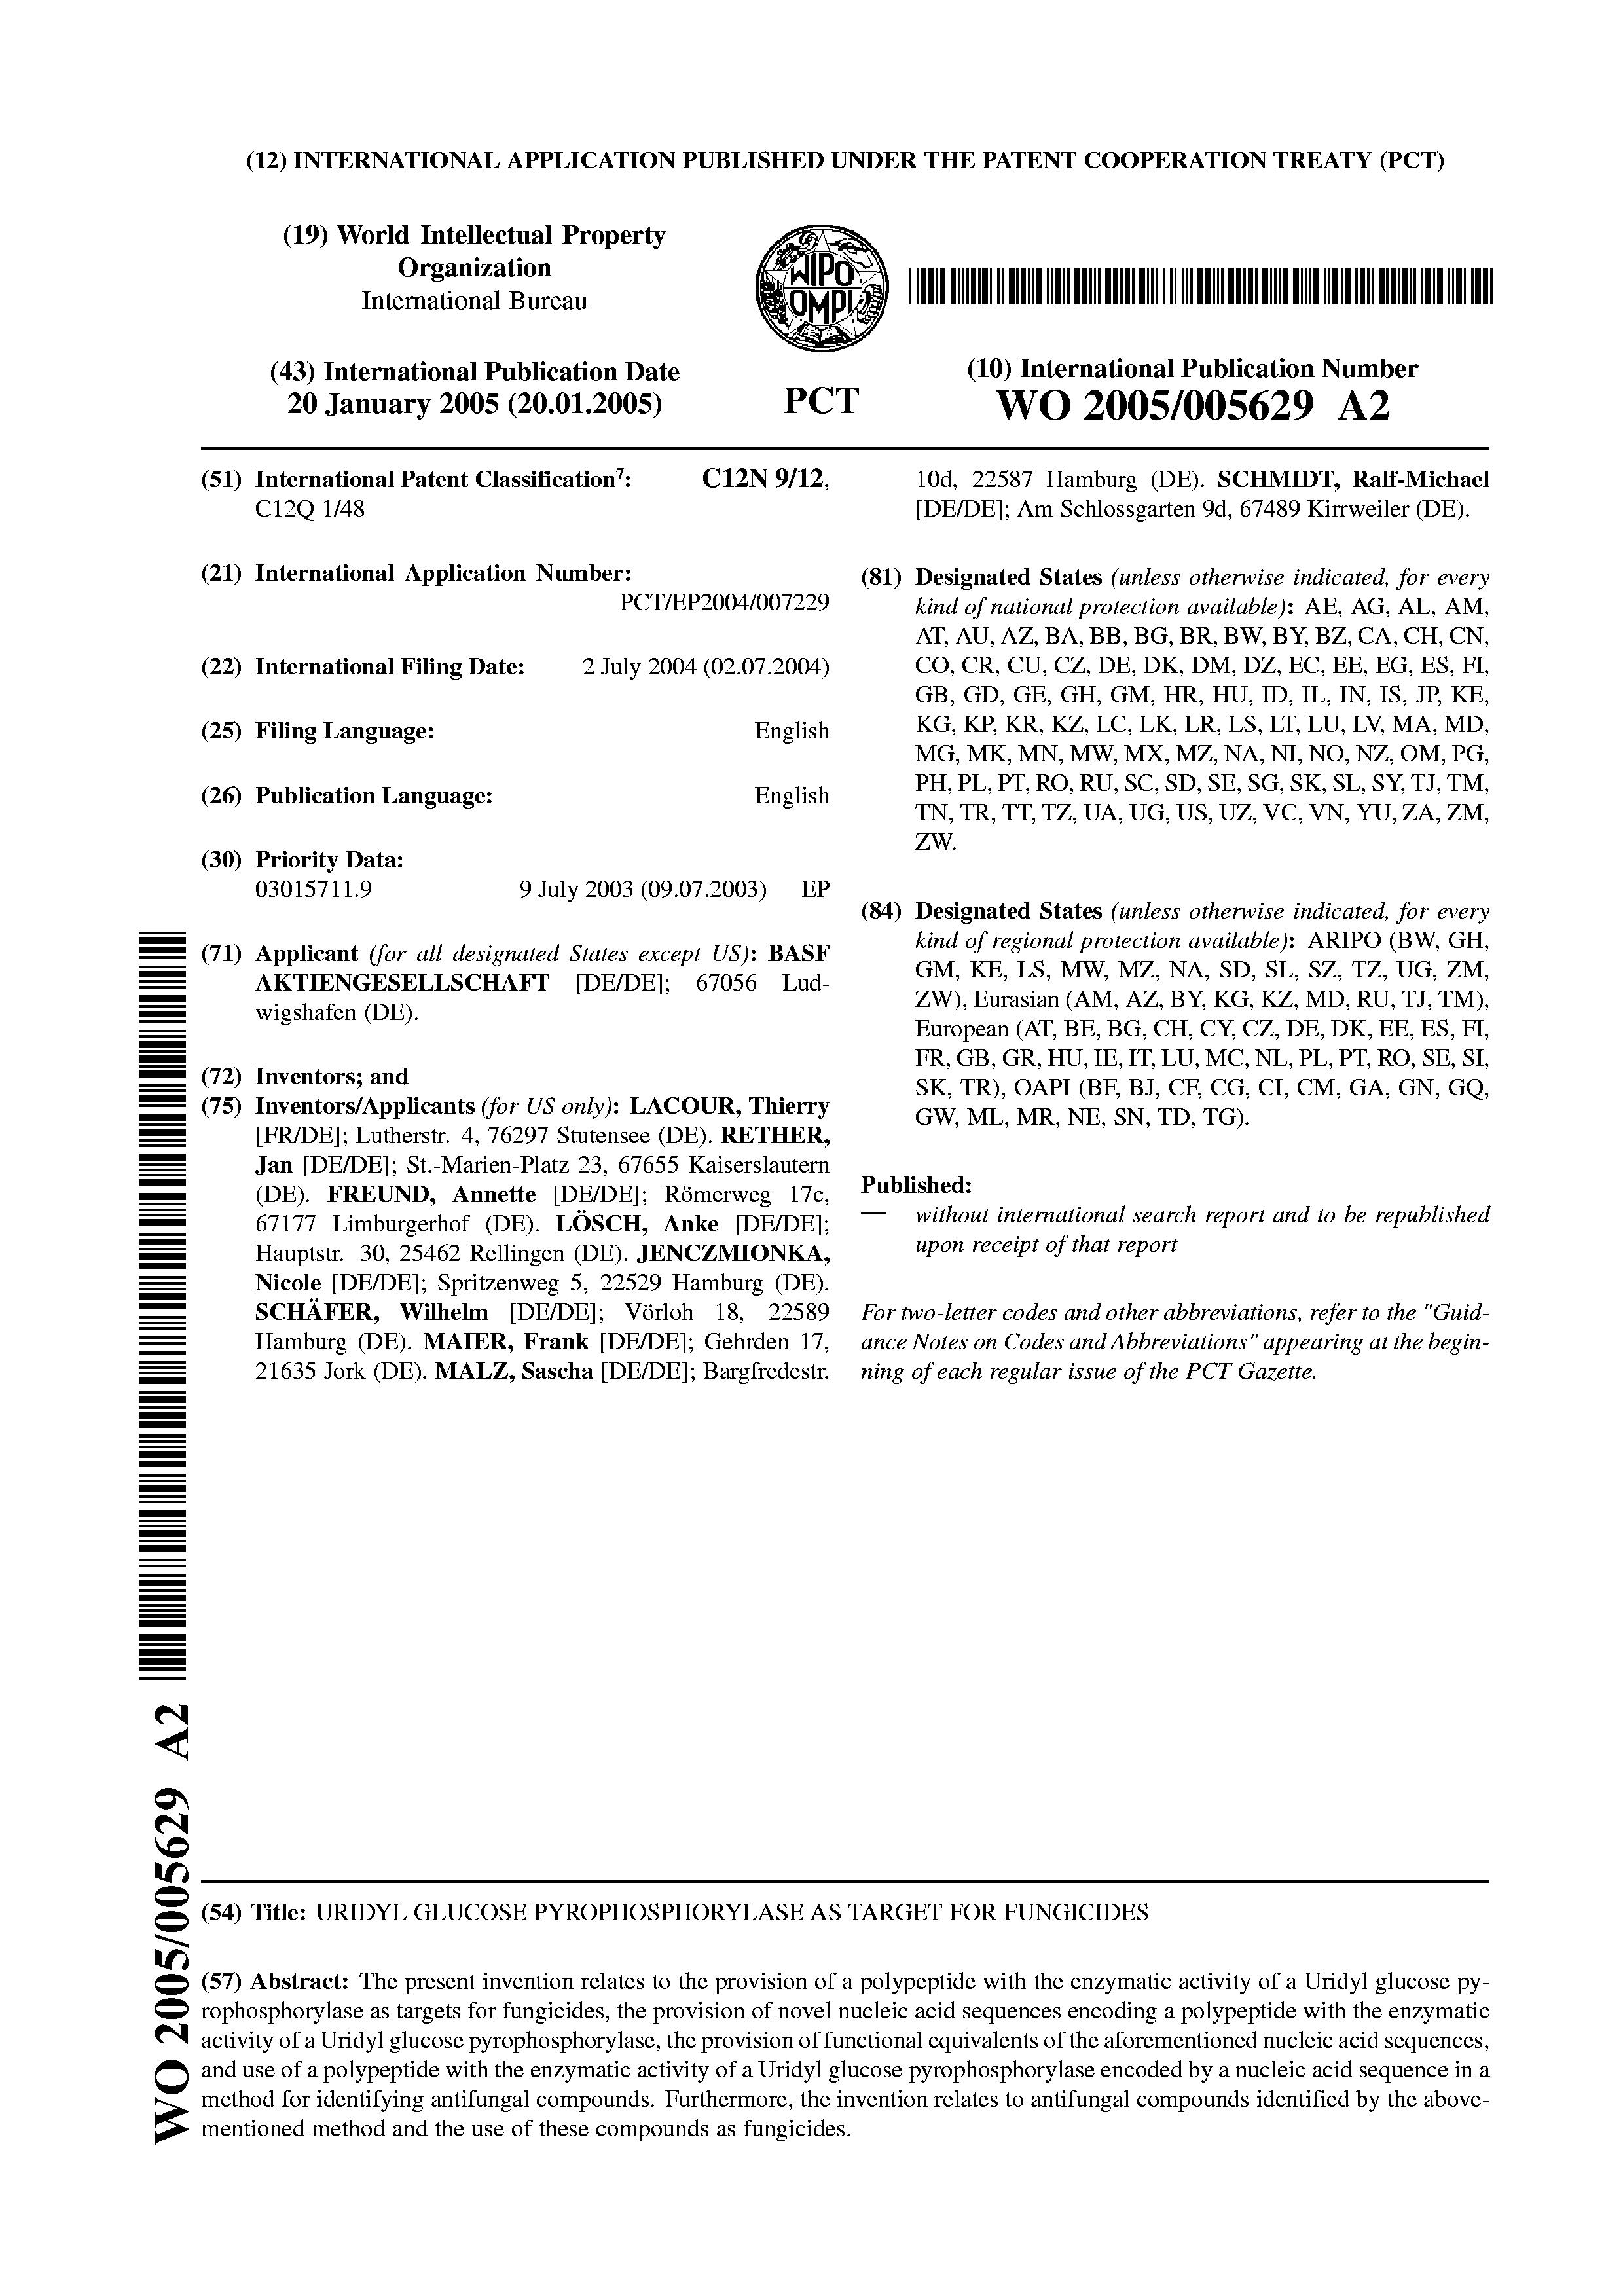 WO 2005/005629 A2 - Uridyl Glucose Pyrophosphorylase As